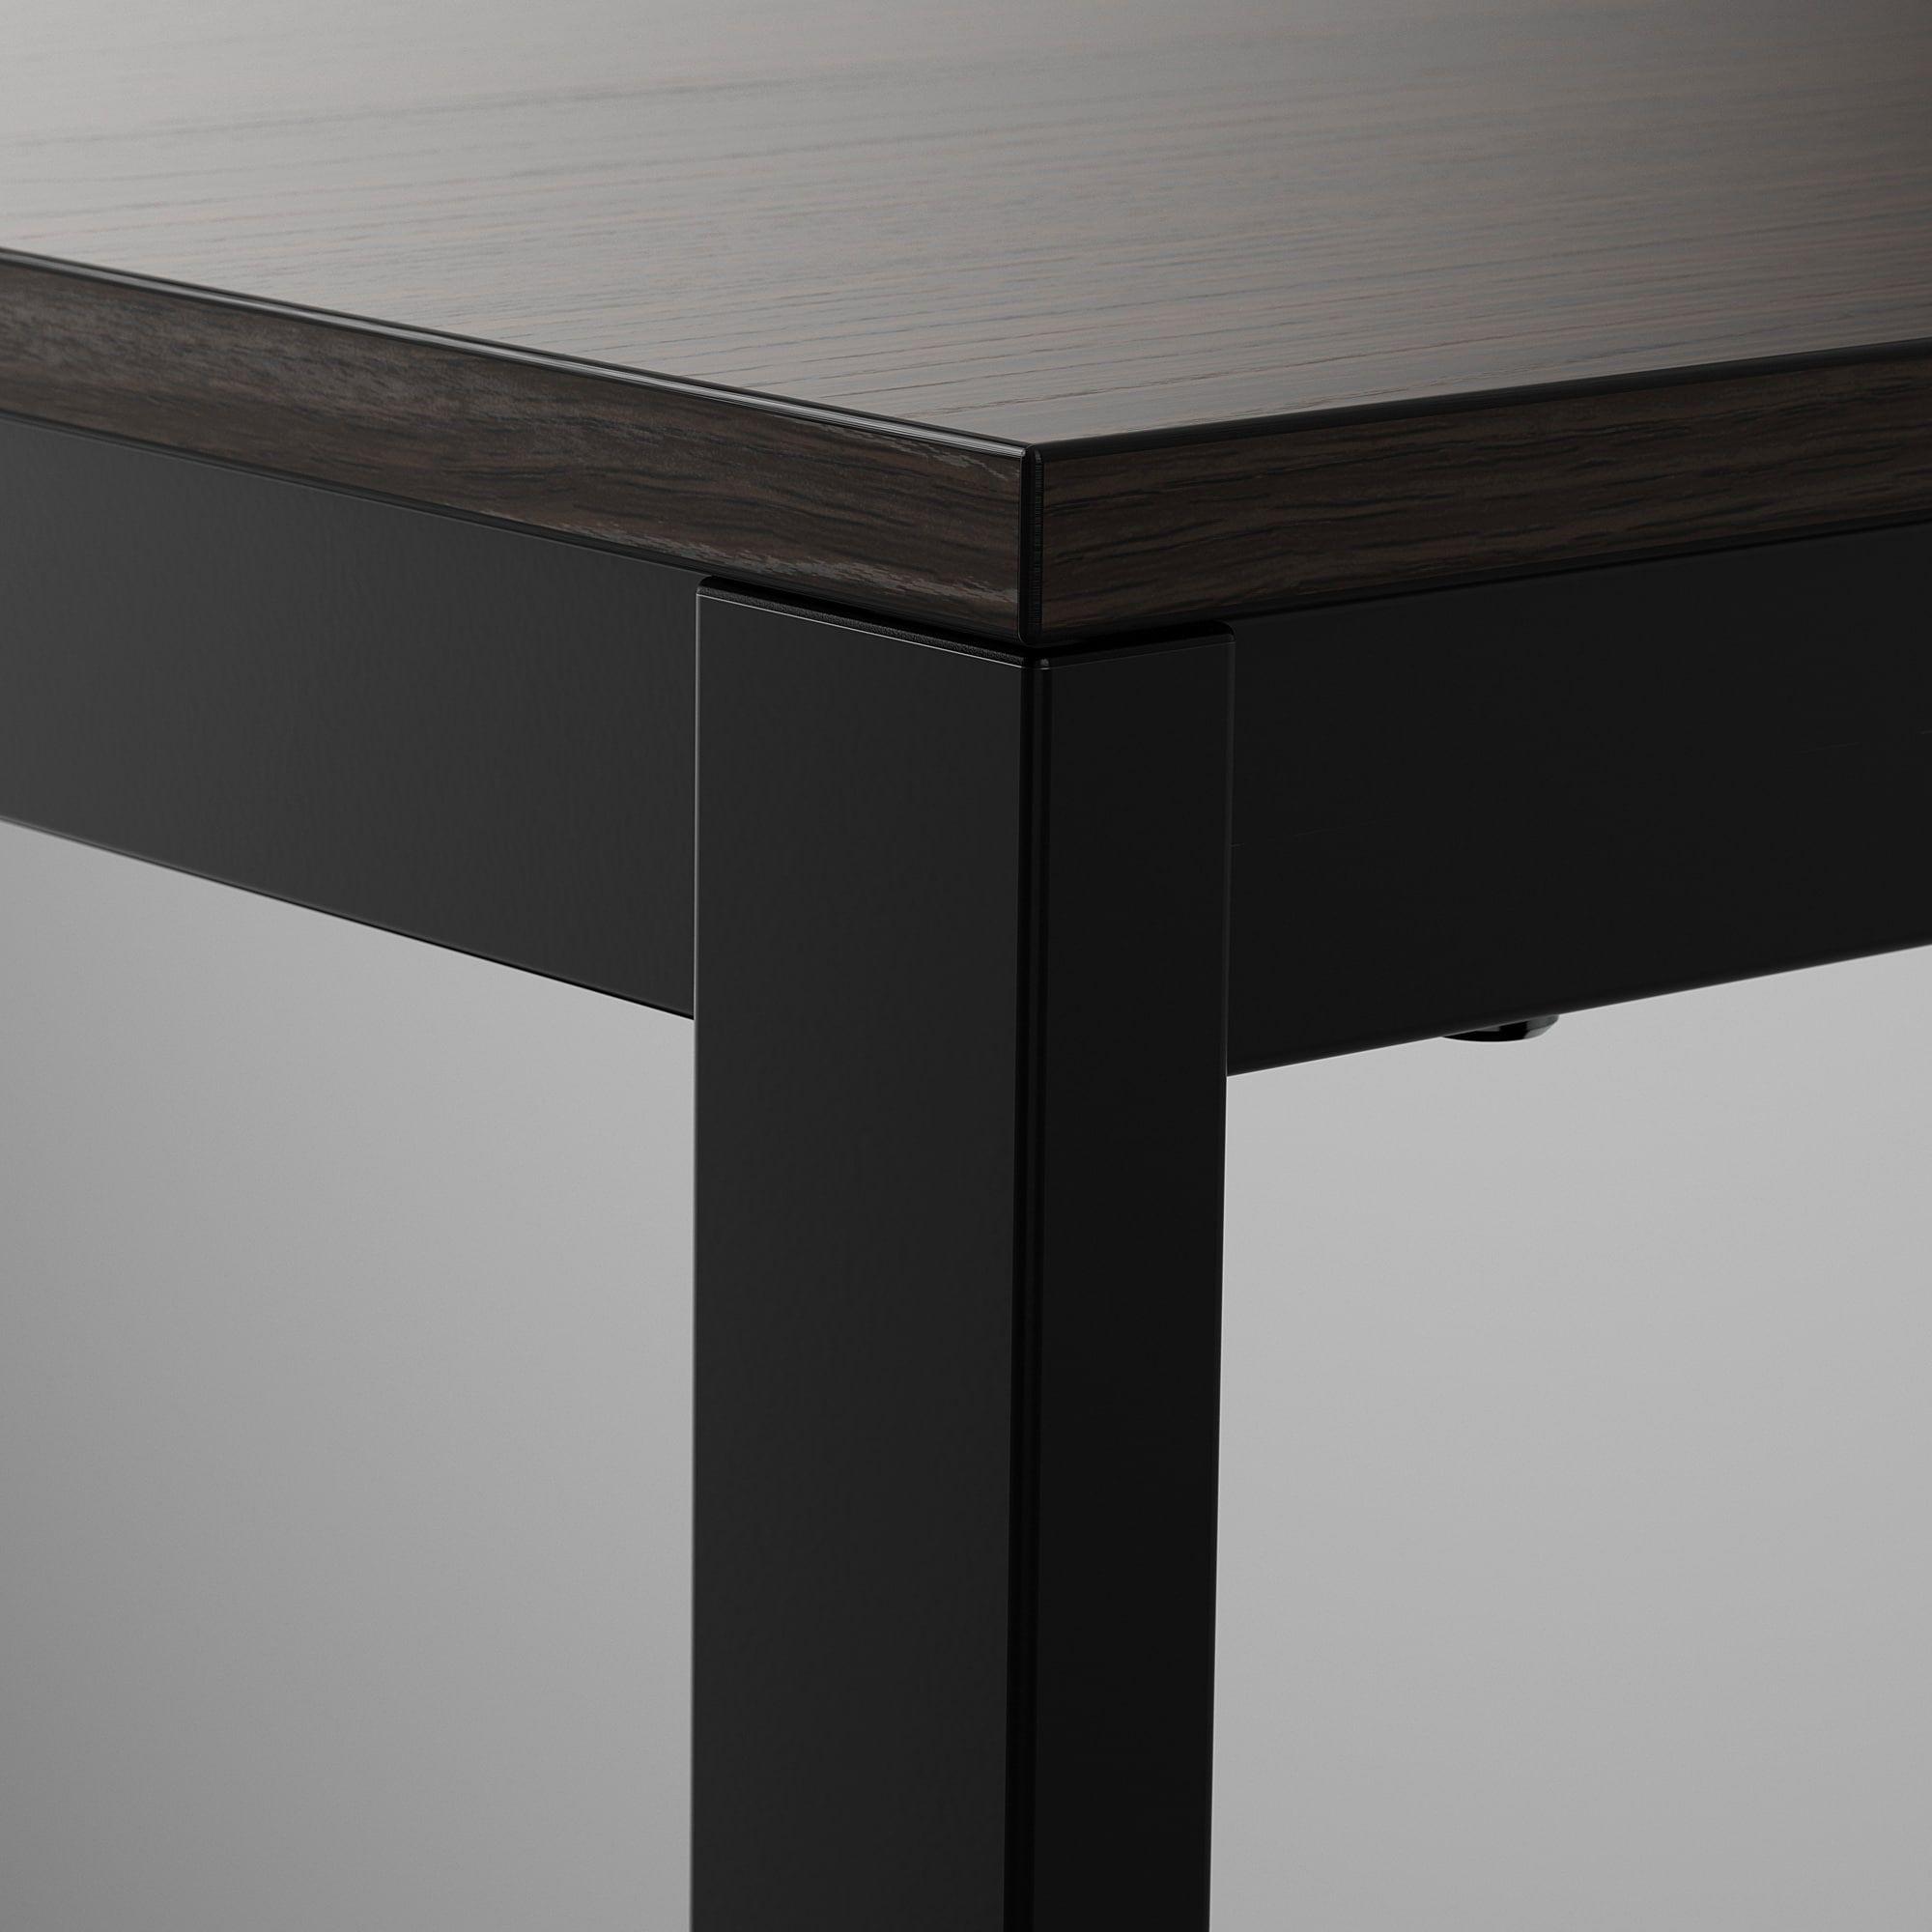 Https Www Ikea Com No No P Vangsta Uttrekkbart Bord Svart Mork Brun 10420152 Ikea En 2020 Table A Rallonge Table Extensible Table A Manger Extensible